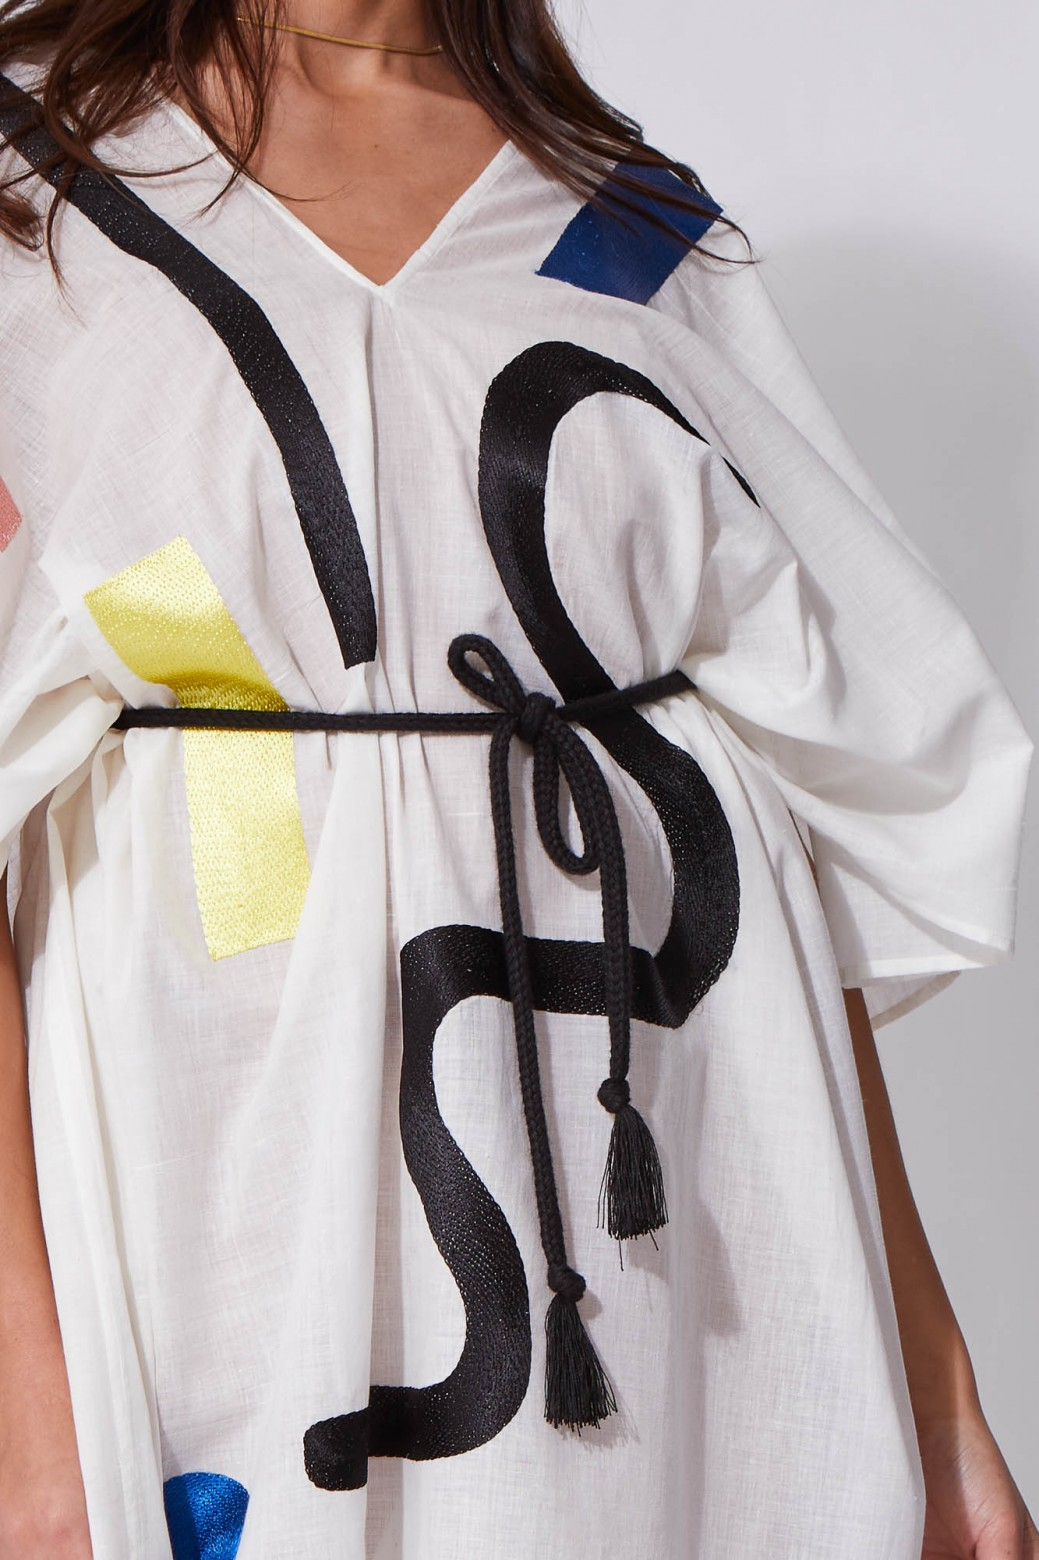 Onde White Dress